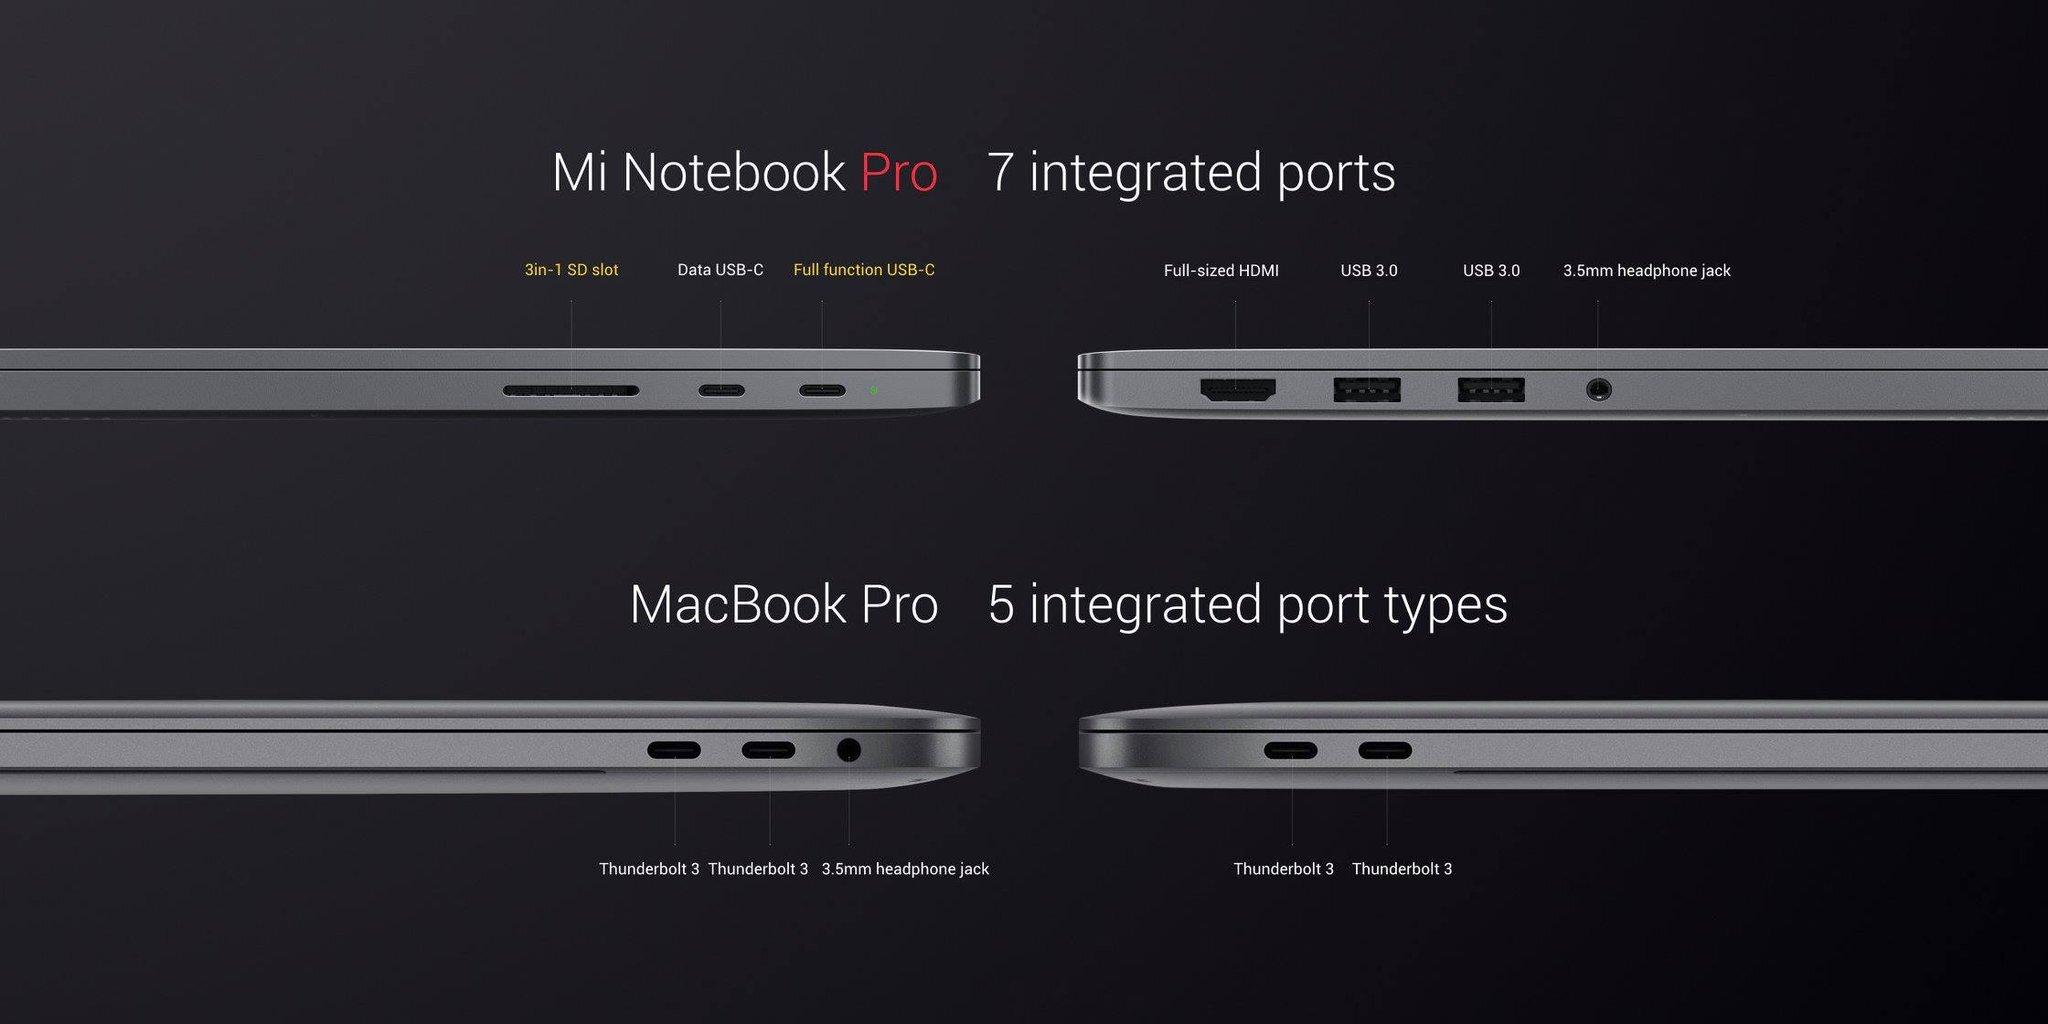 puertos mi notebook pro xiaomi